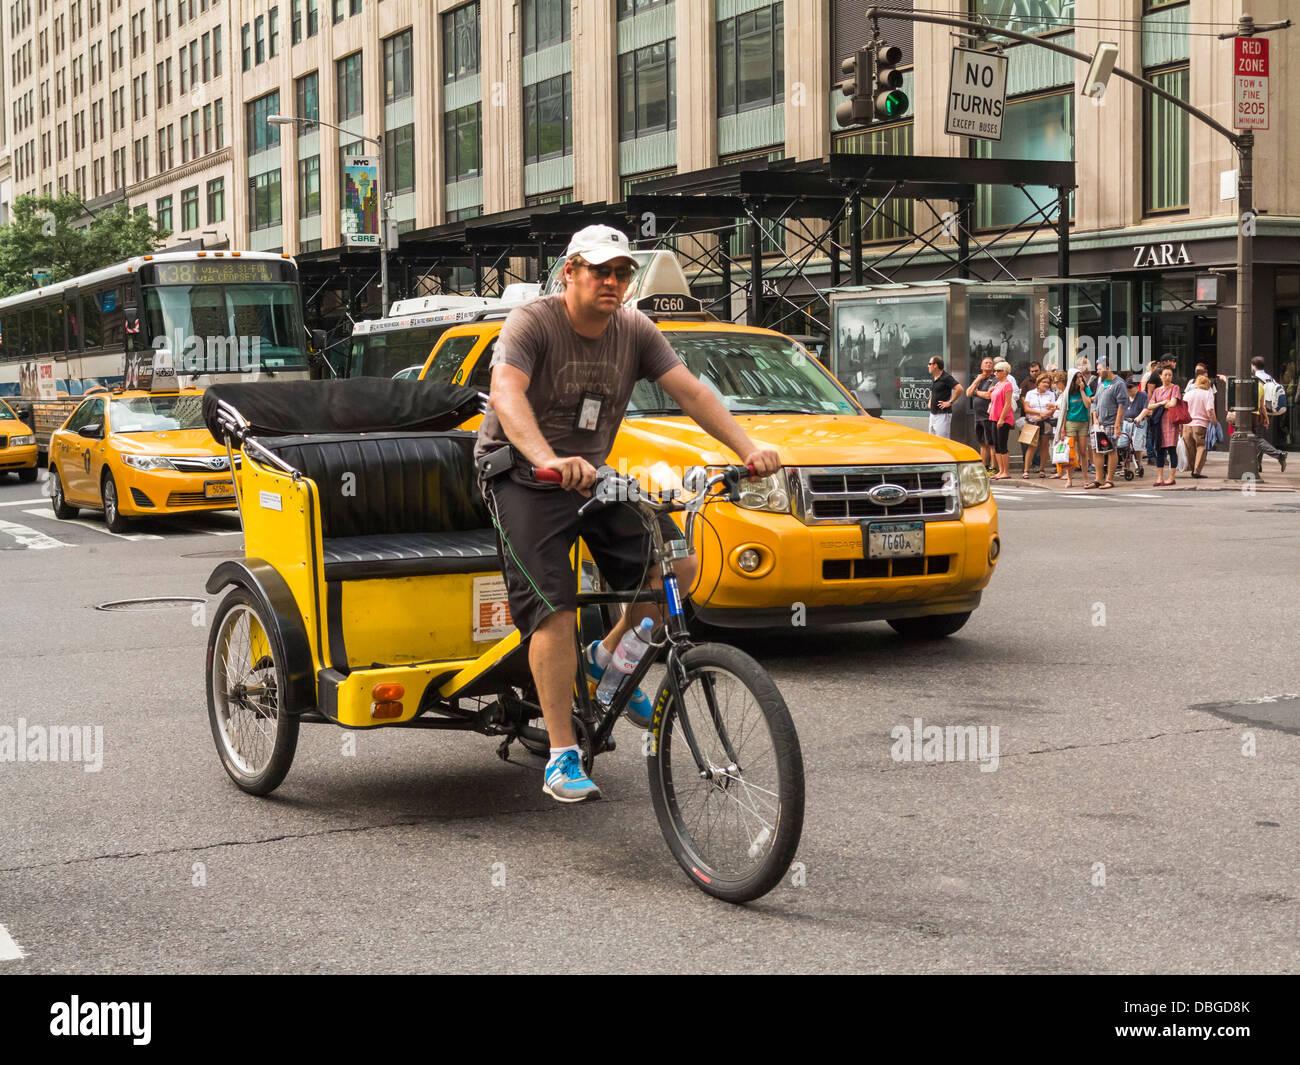 Pedicab taxi cycliste à New York City Photo Stock